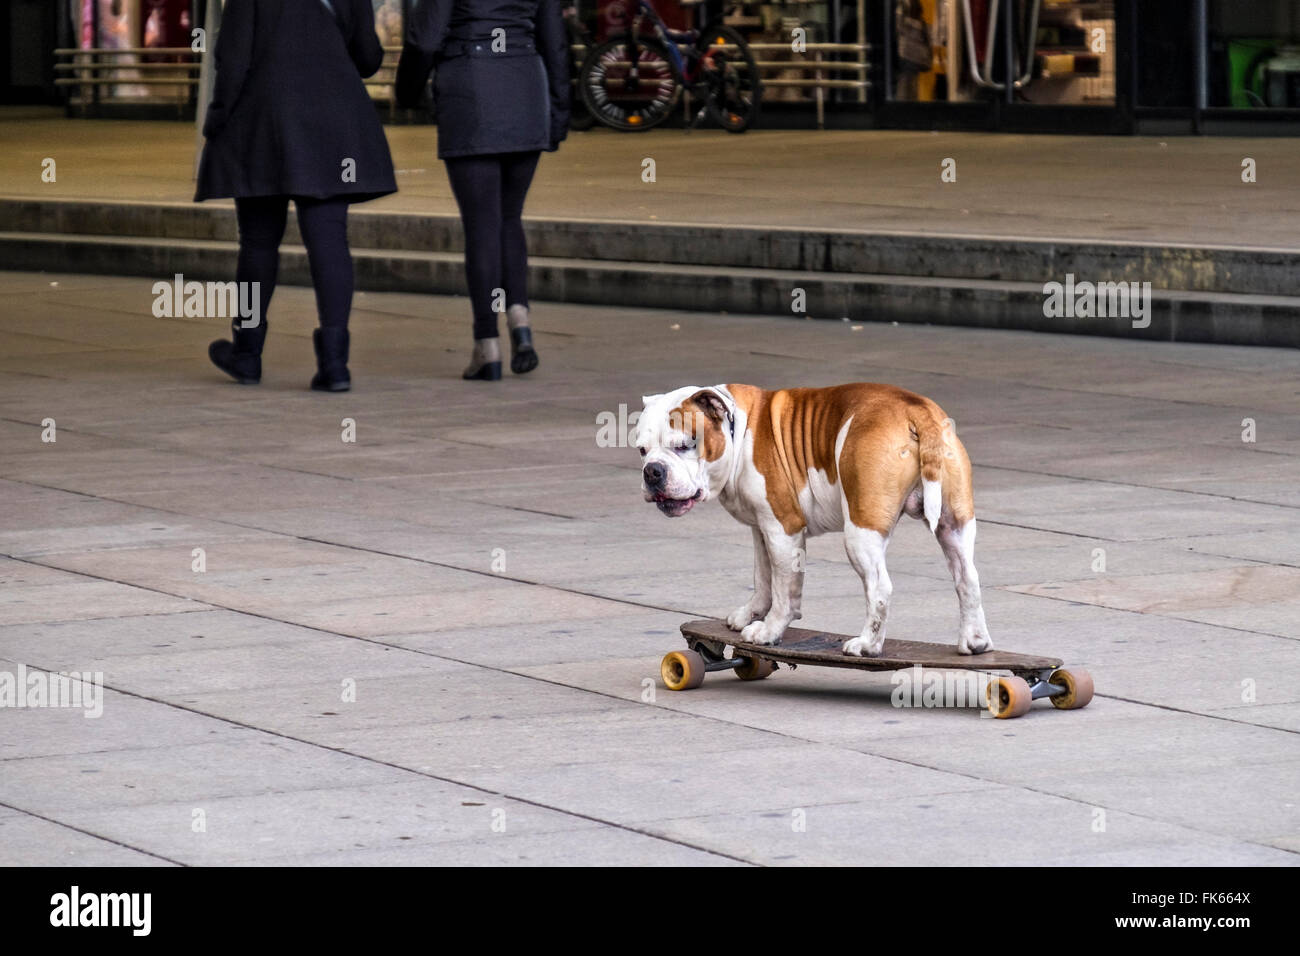 dog-on-skateboard-skateboarding-pet-in-b